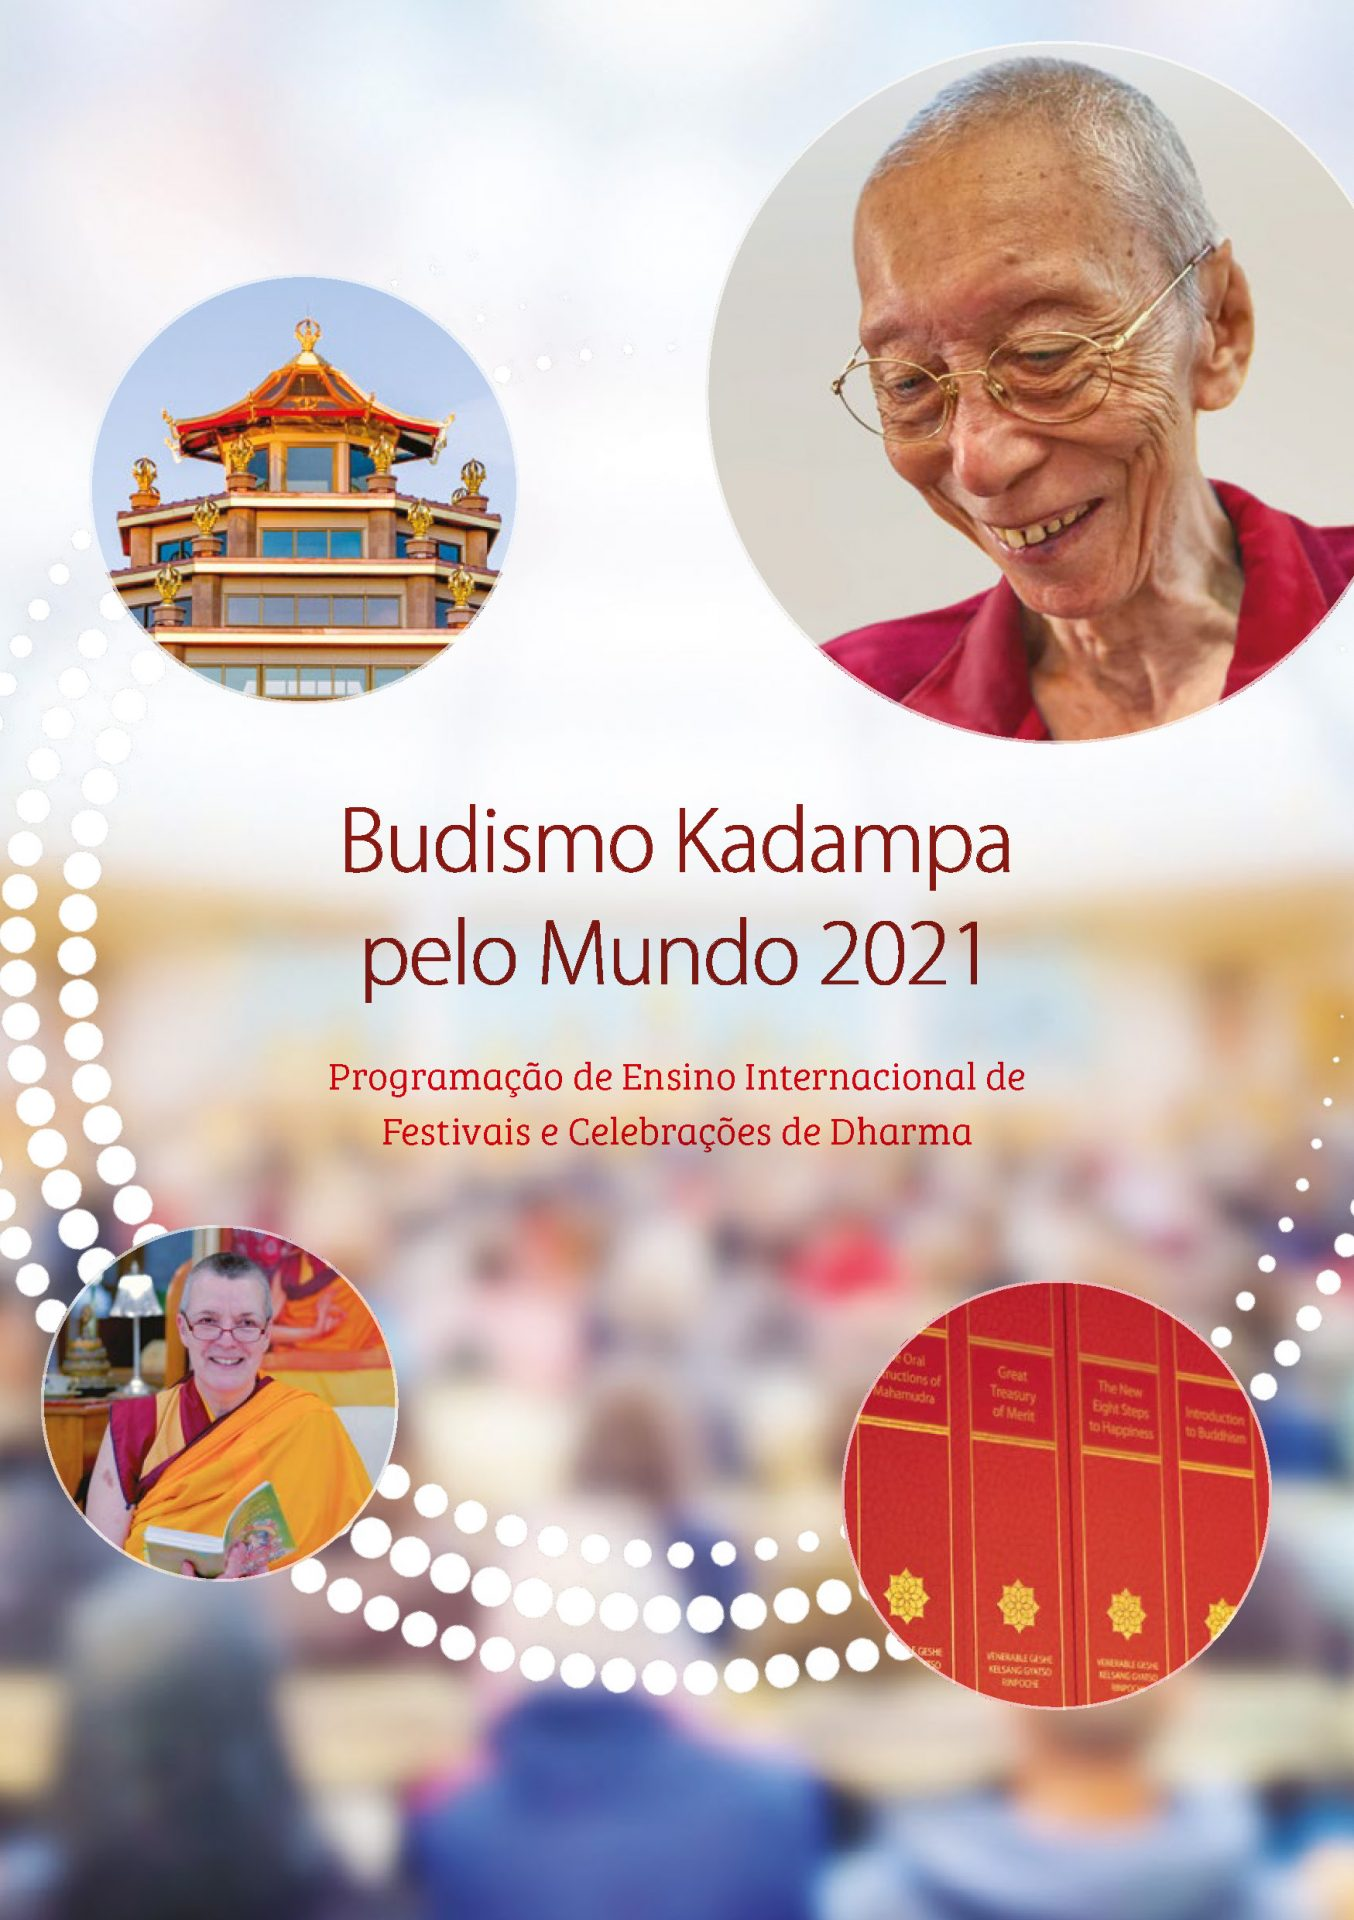 Budismo Kadampa Mundial